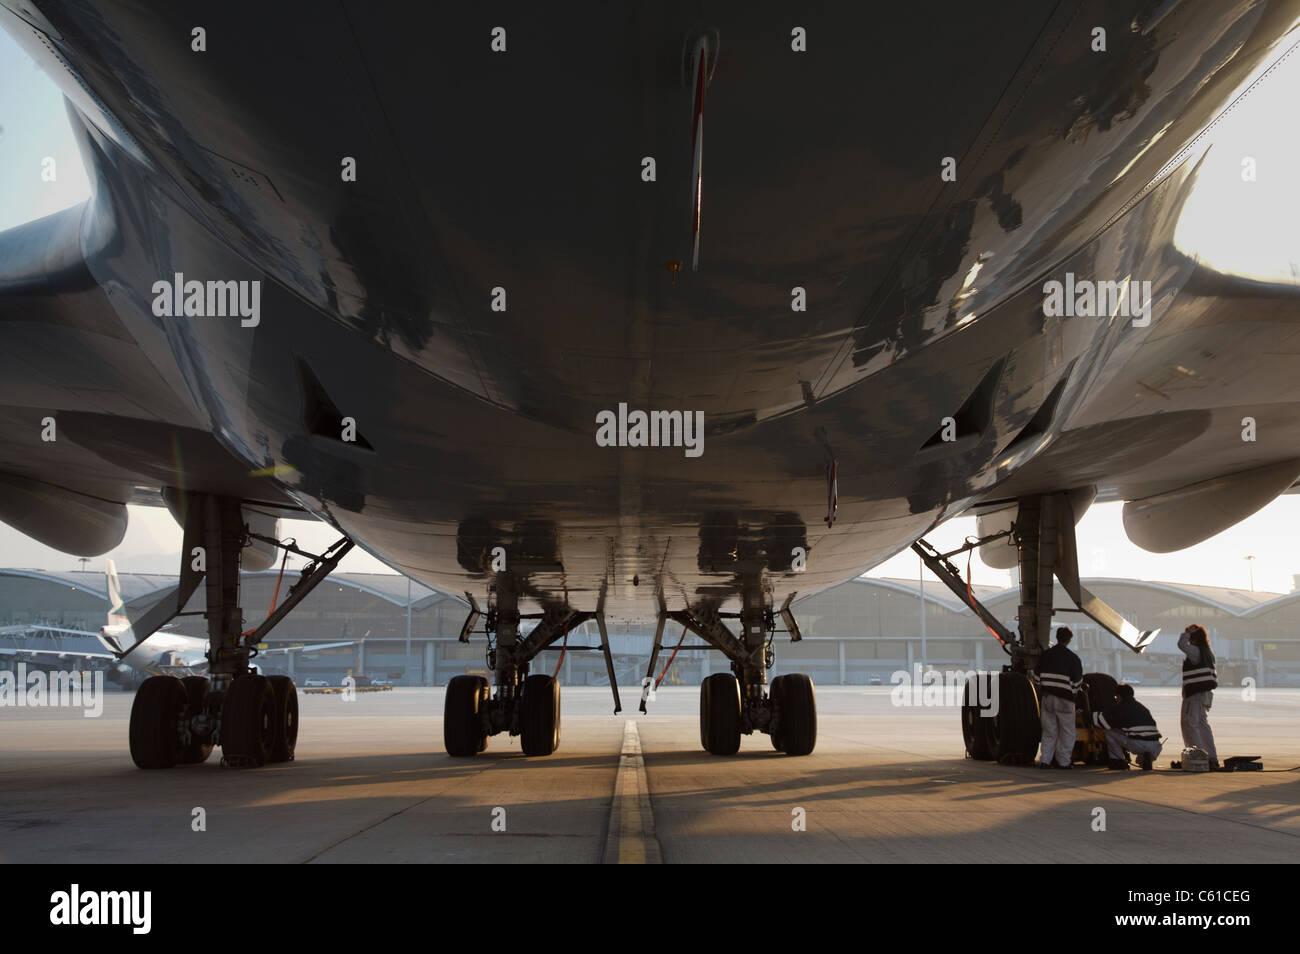 Aeroplane Wheels Stock Photos Amp Aeroplane Wheels Stock